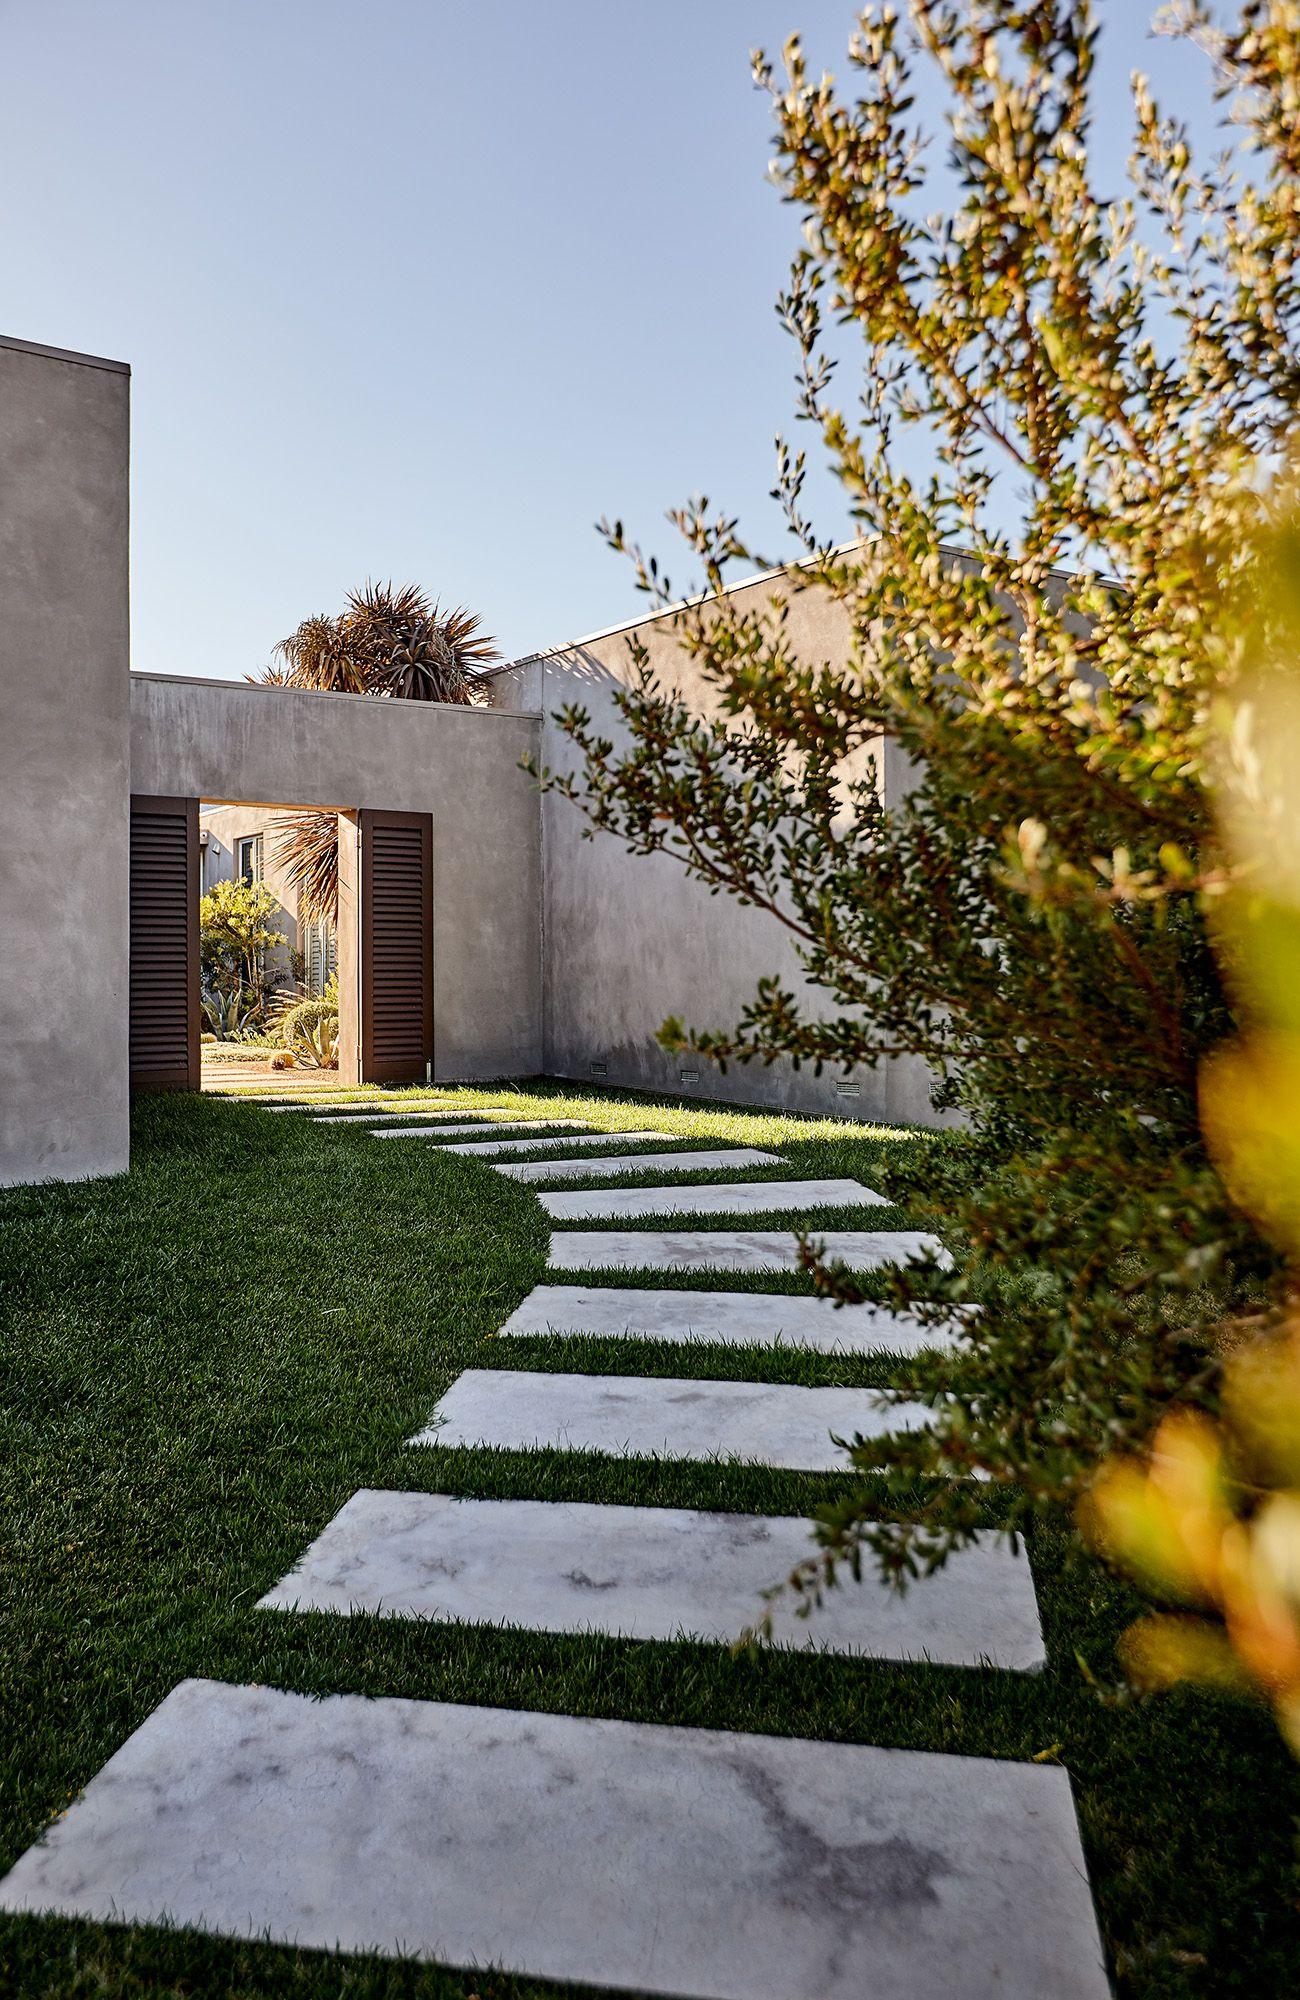 Photo of A Beach Home Garden Designed for the Coastal Conditions